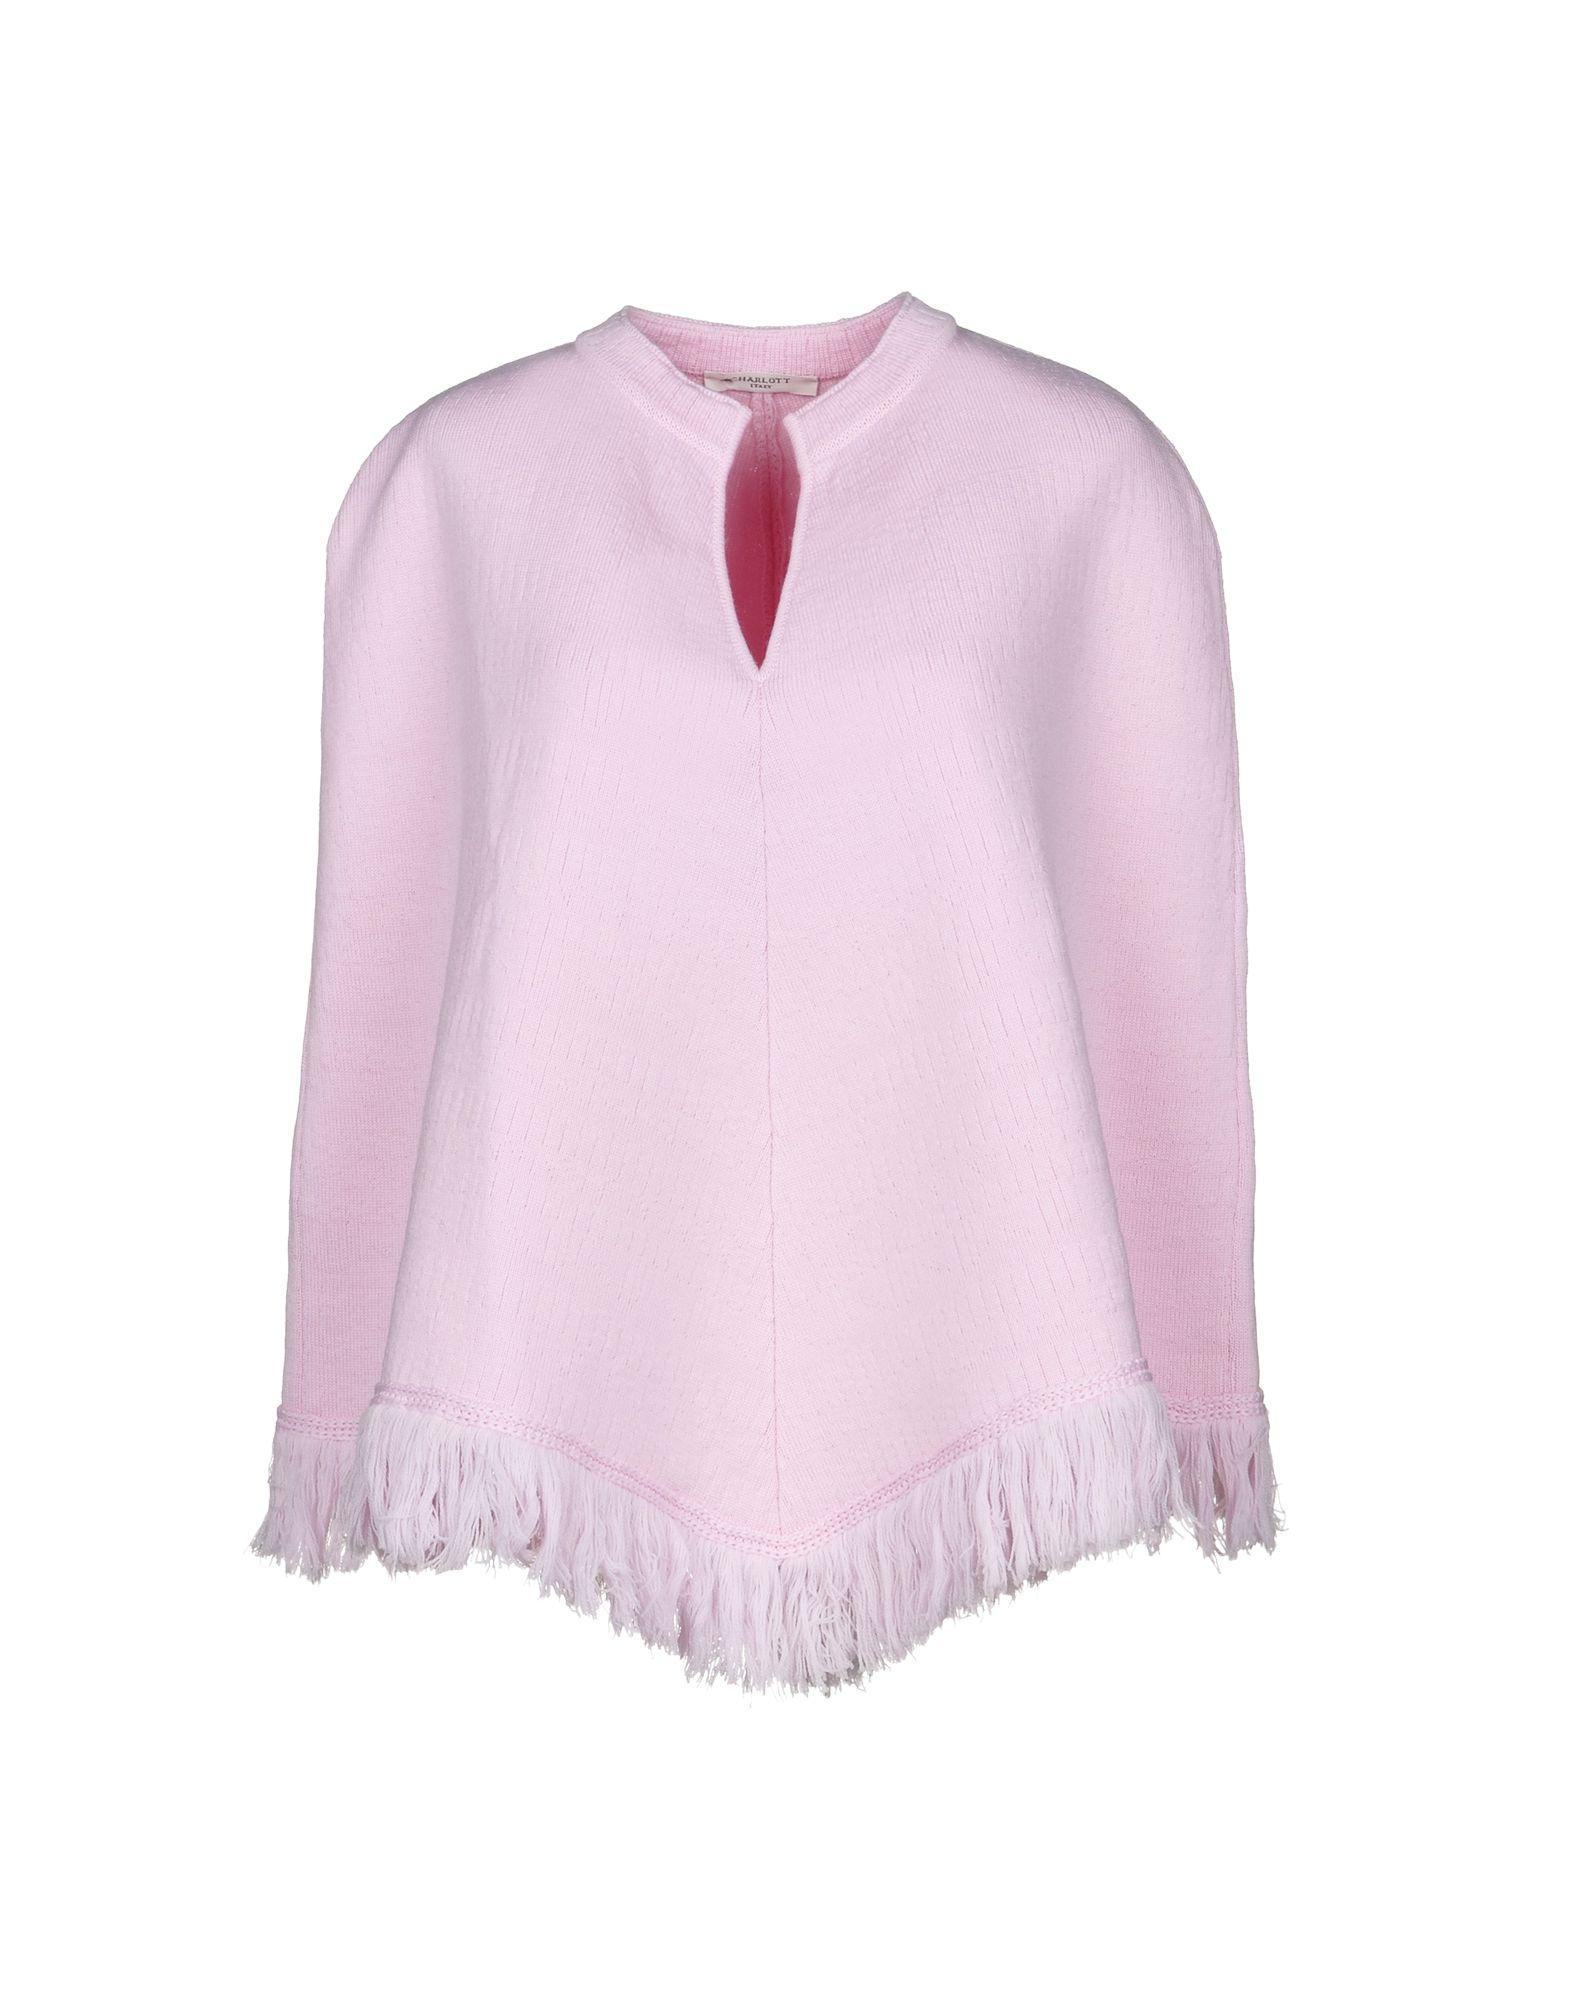 Charlott Cape In Pink